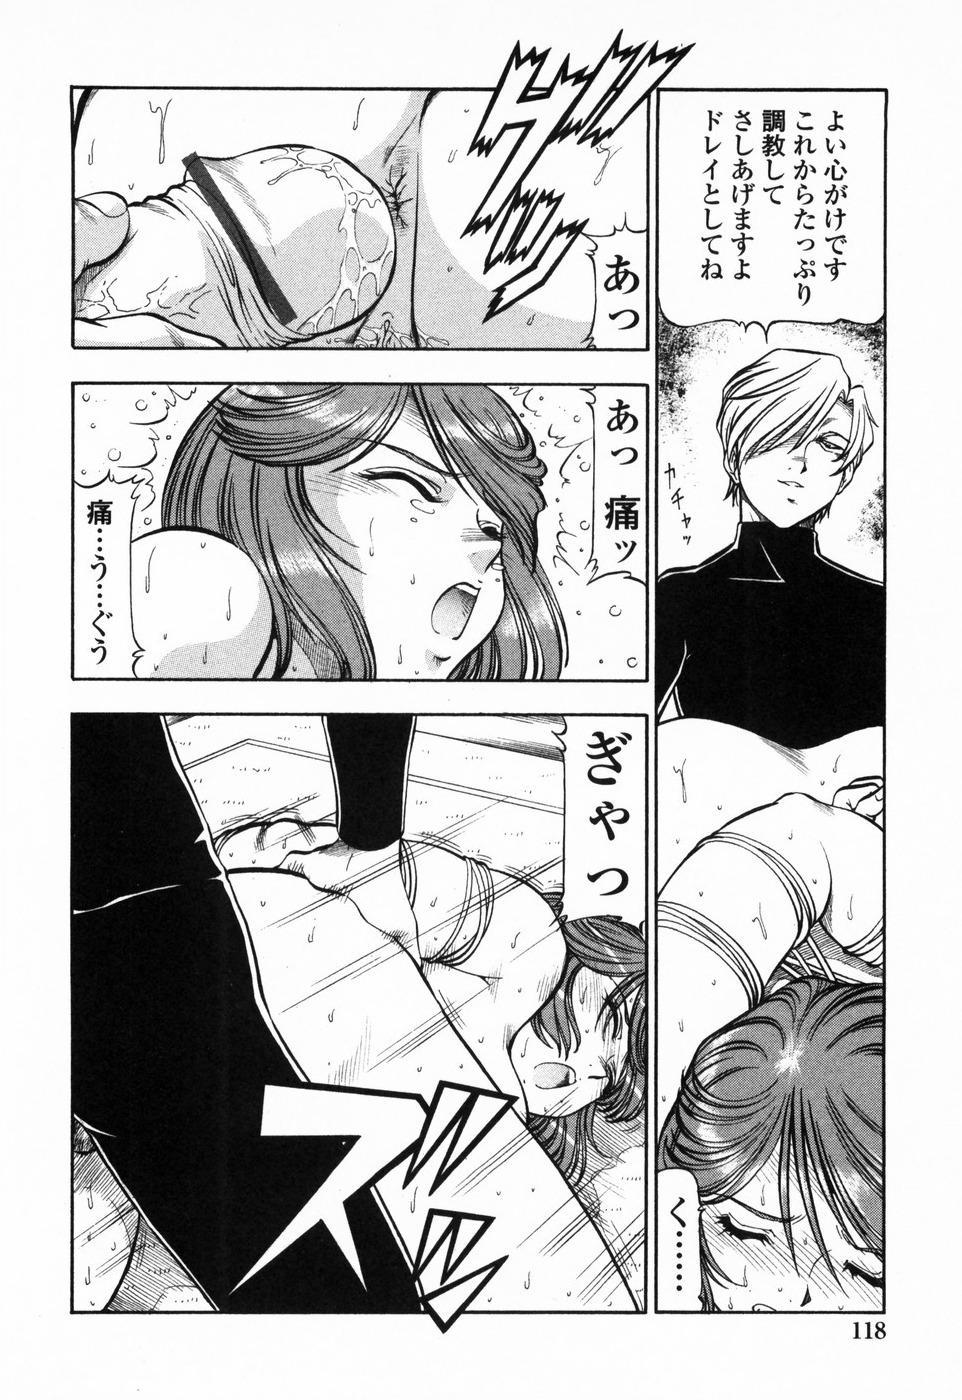 Kichiku Houteishiki - Equation of brutal person 124